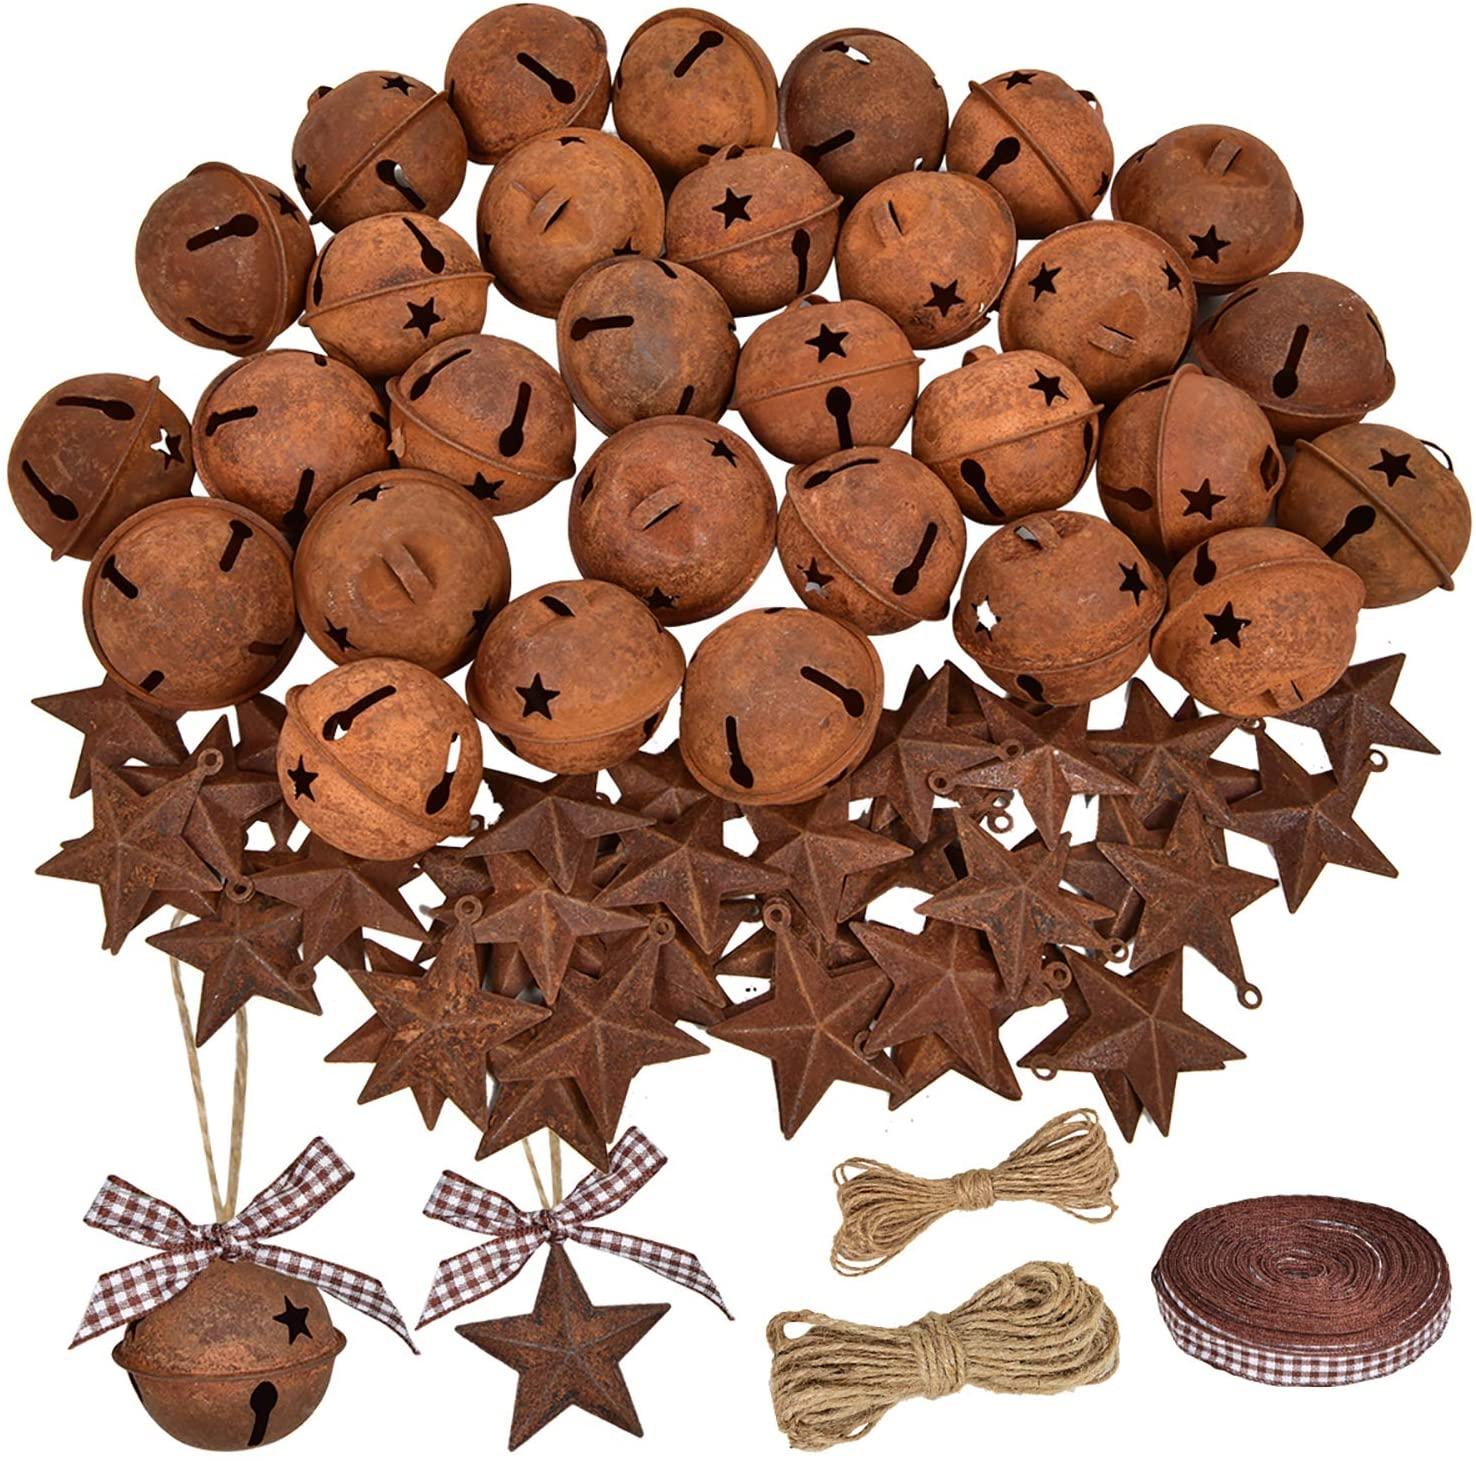 DearHouse 80 Pcs Rusty Metal Christmas Jingle Bells with Mini Rusted Metal Barn Stars, Sleigh Bells Rustic Craft Stars Cutouts with Jute Twine Plaid Ribbon for Christmas Tree Holiday Season Decor